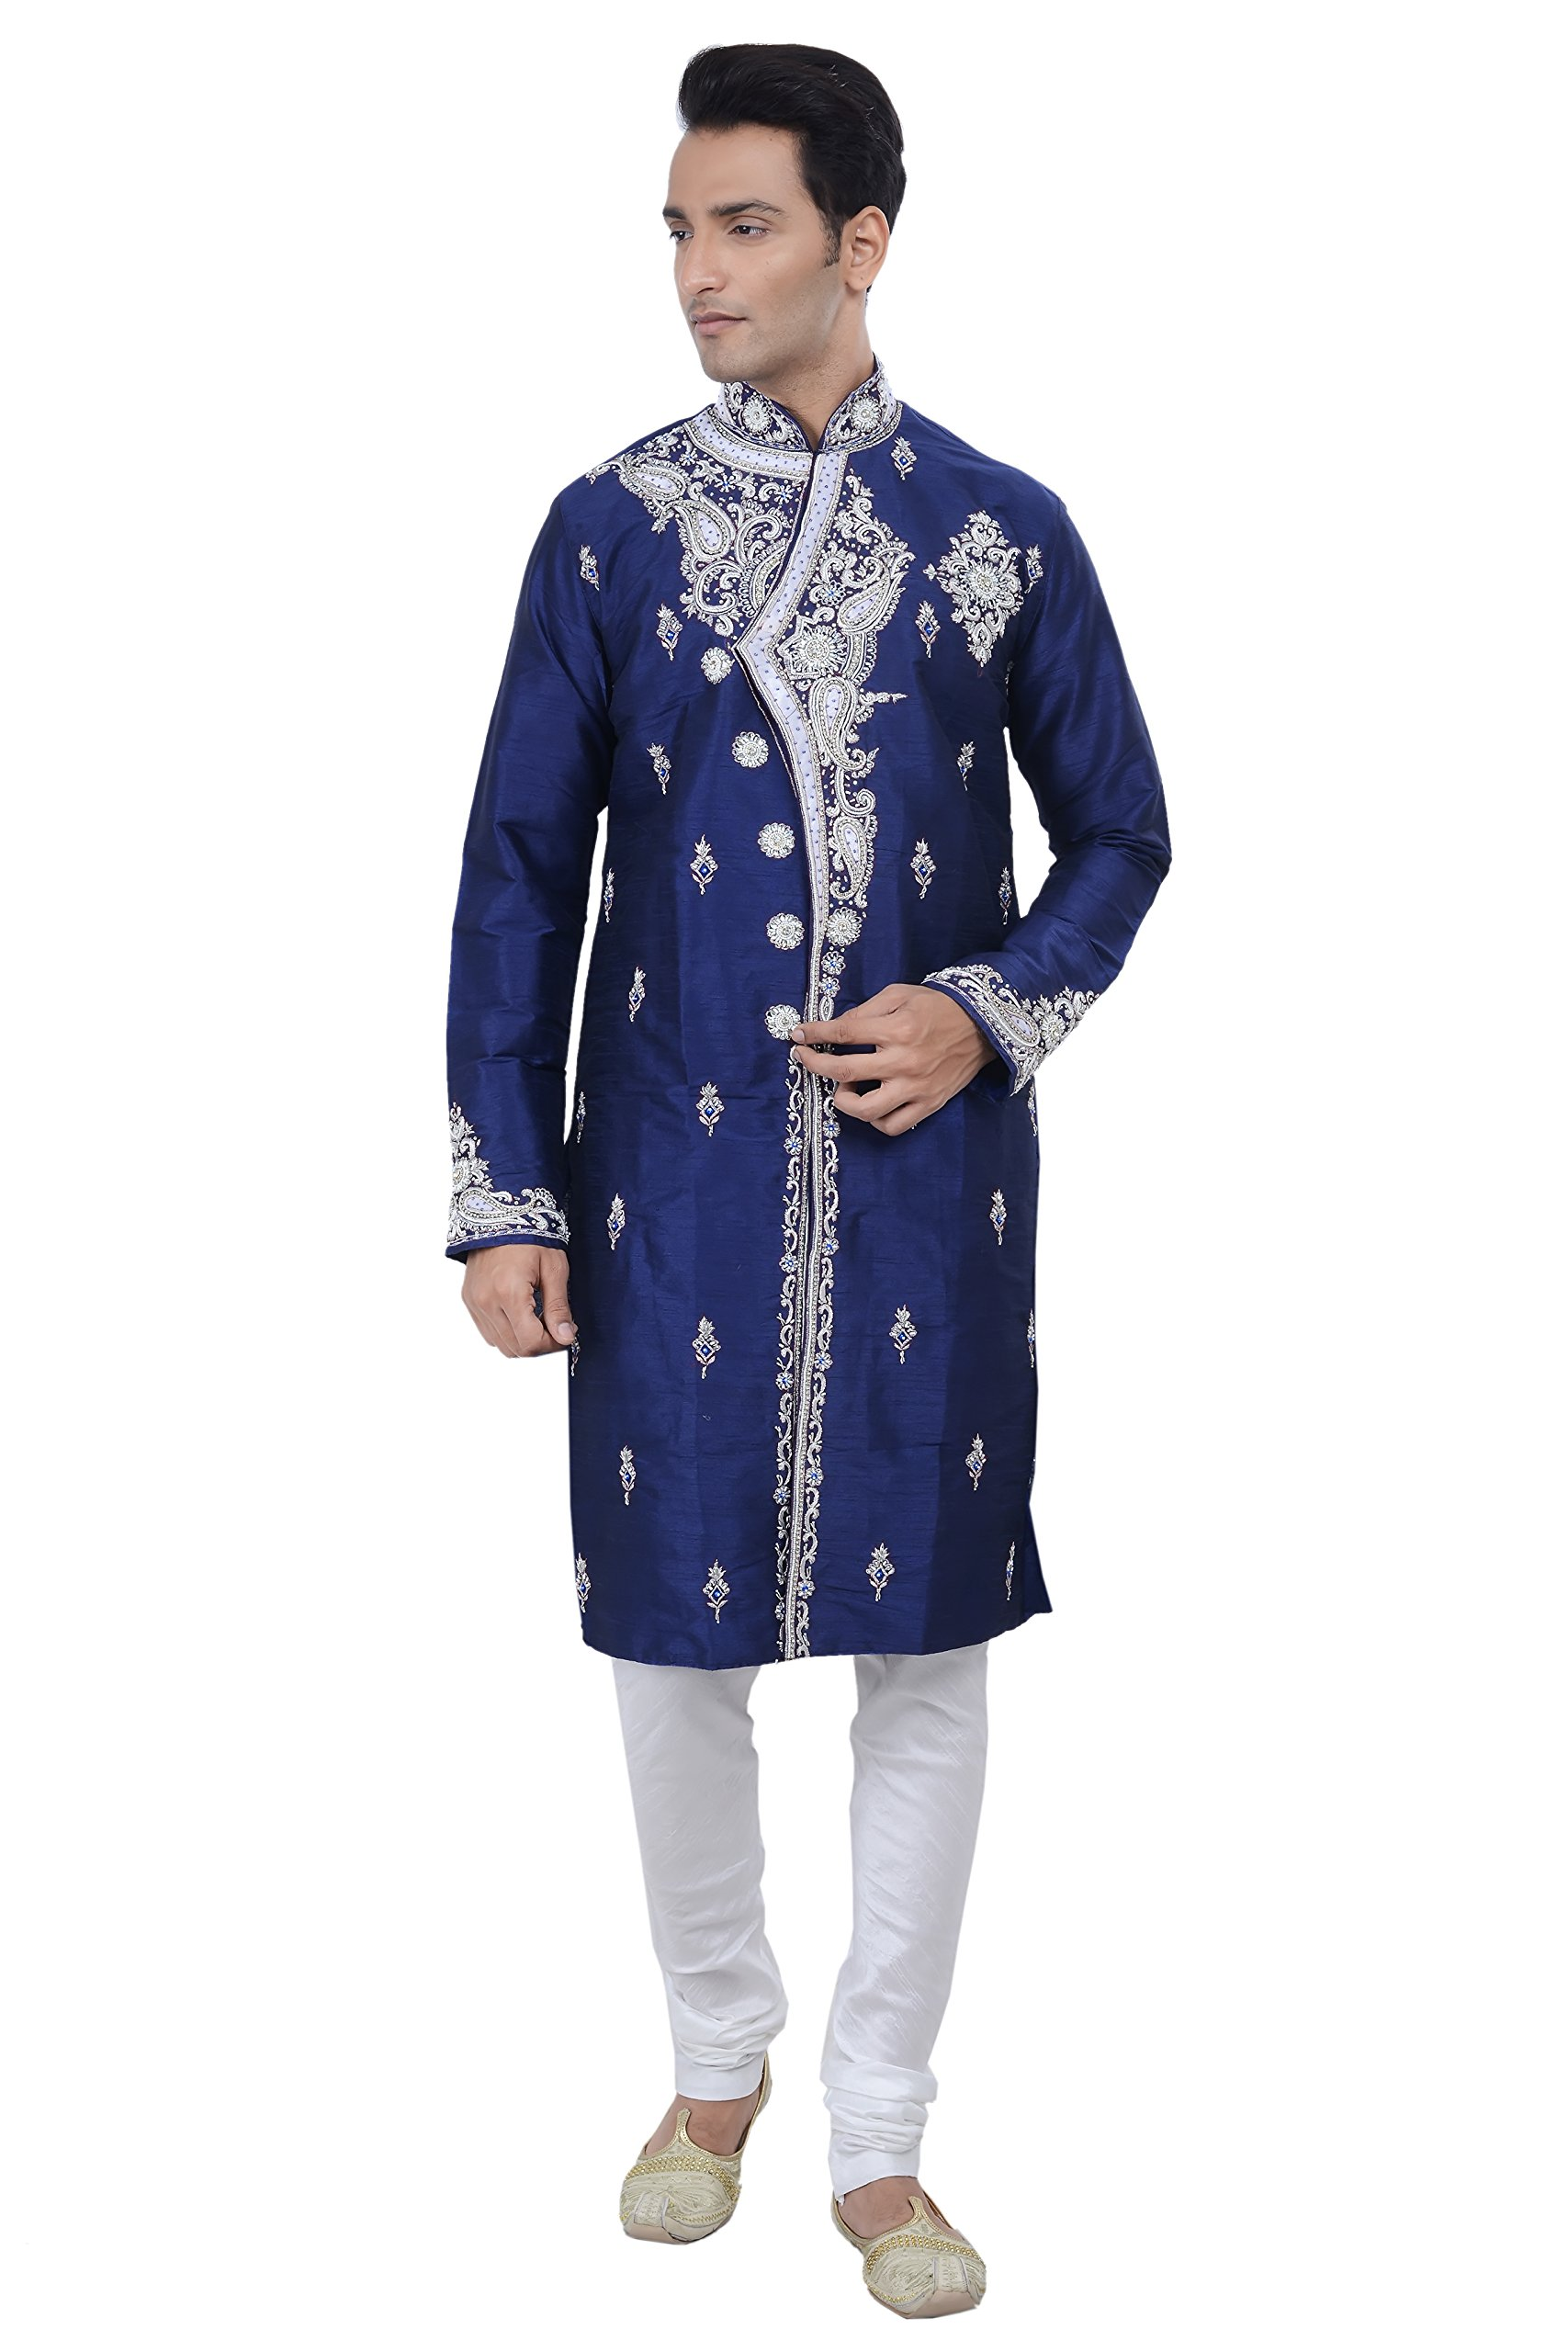 Rajwada Indian Designer Off-White Kurta Sherwani for Mens 2pc Suit